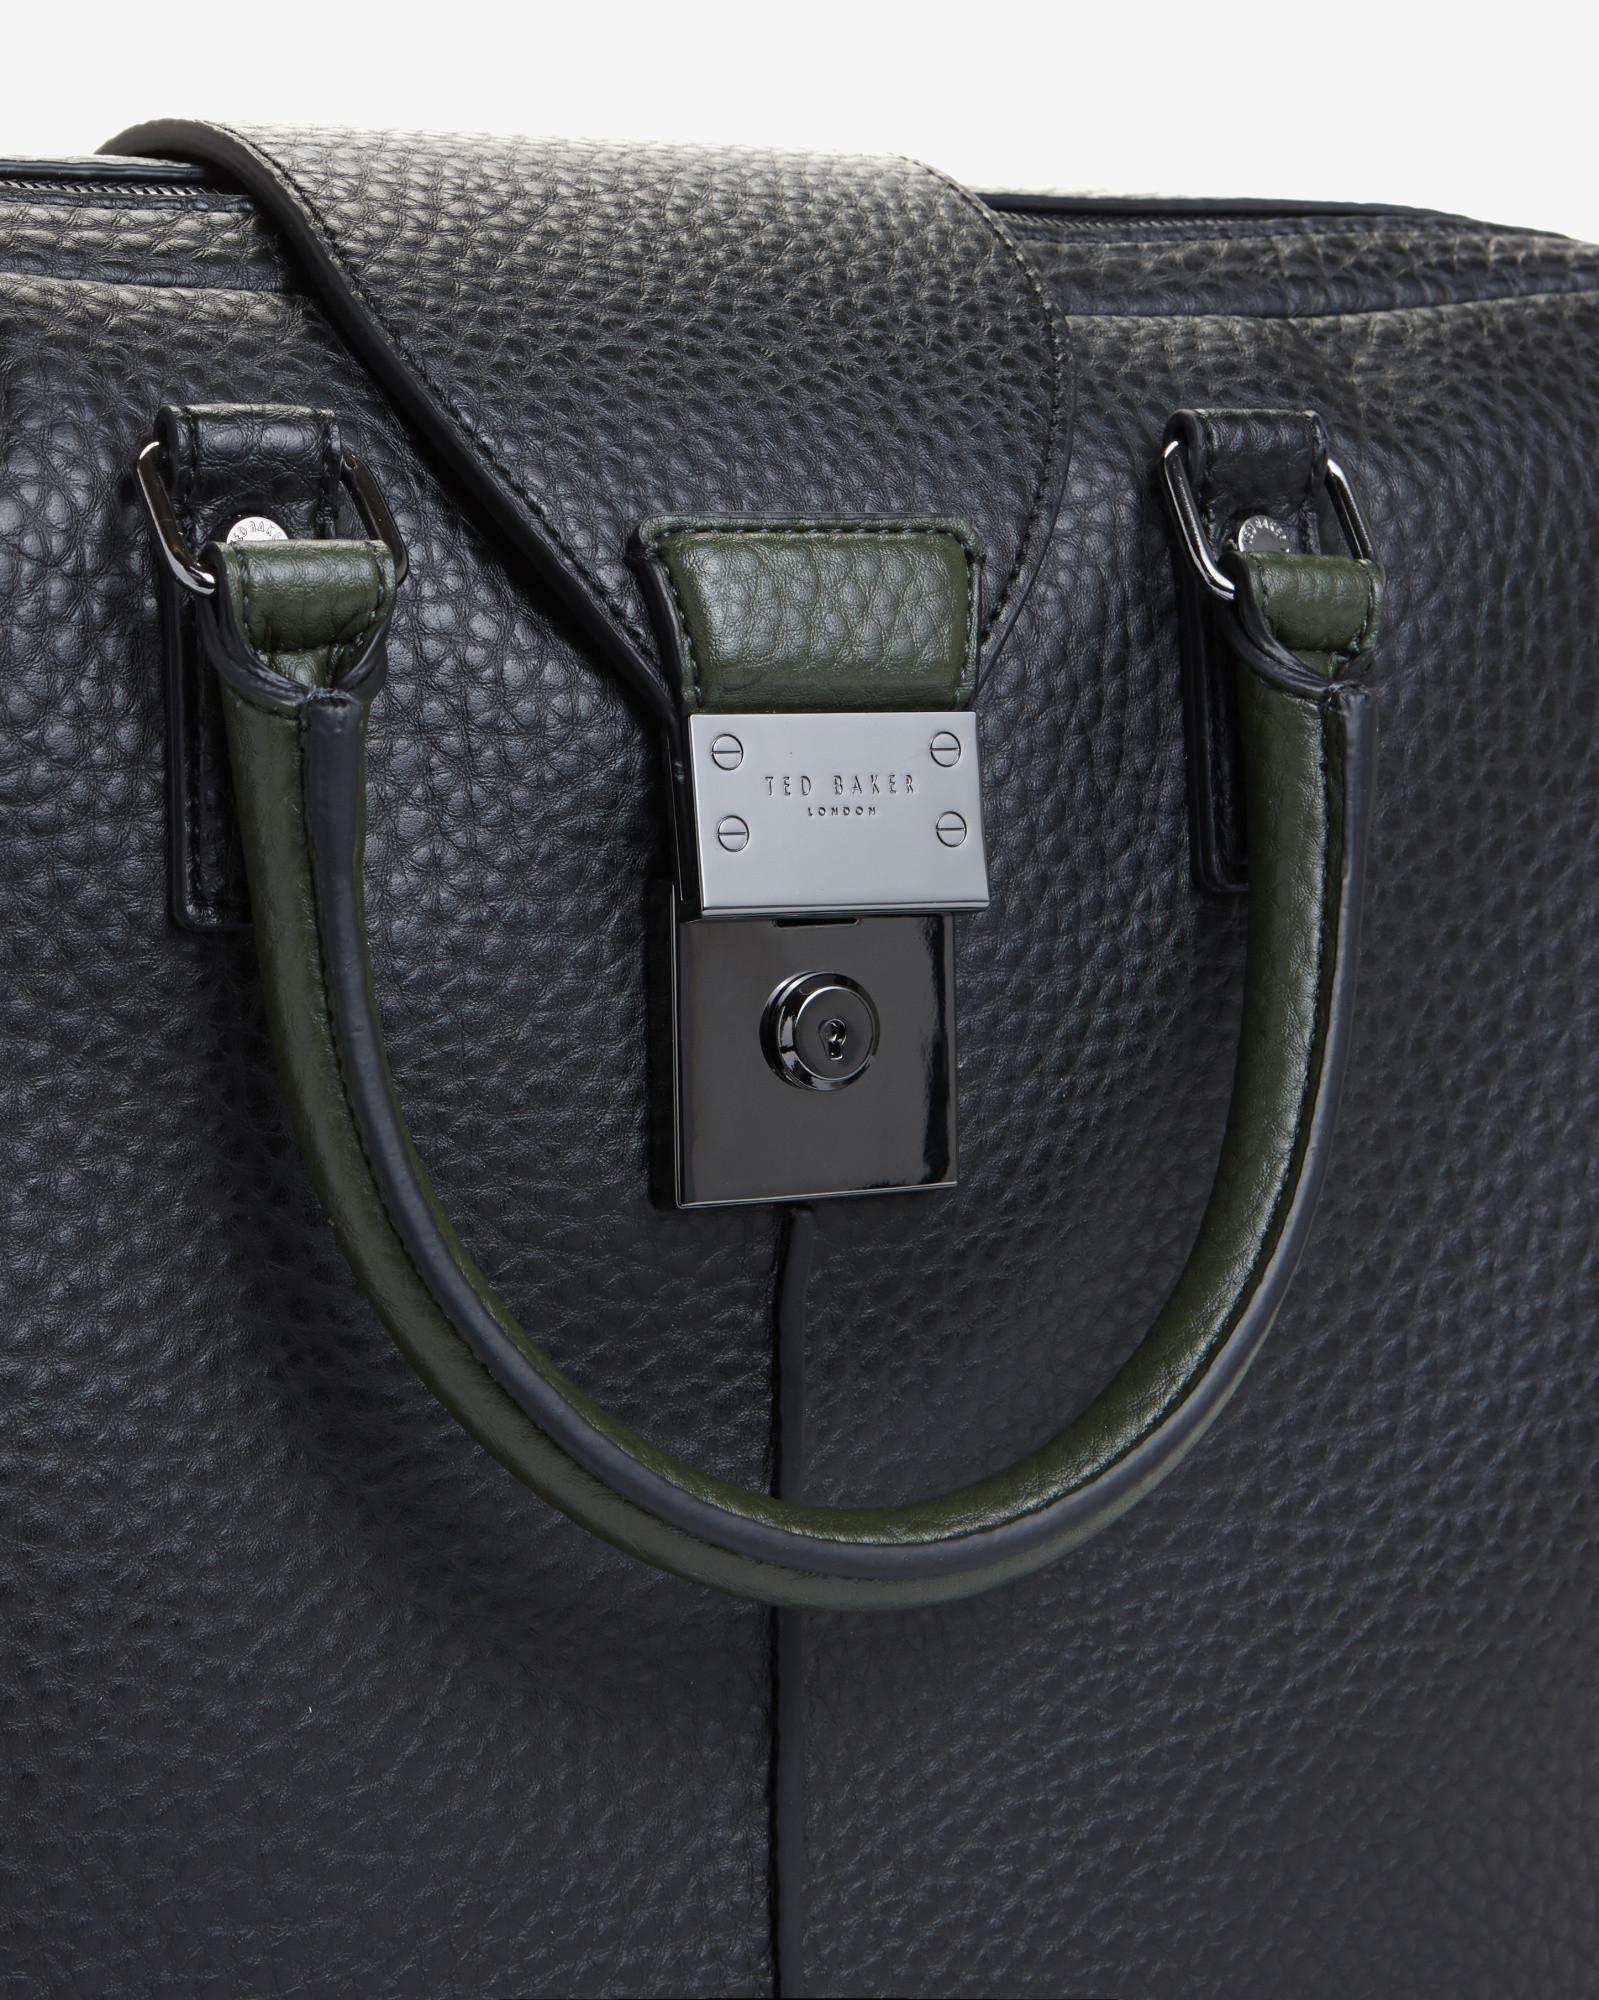 Ted Baker Keycork Document Bag